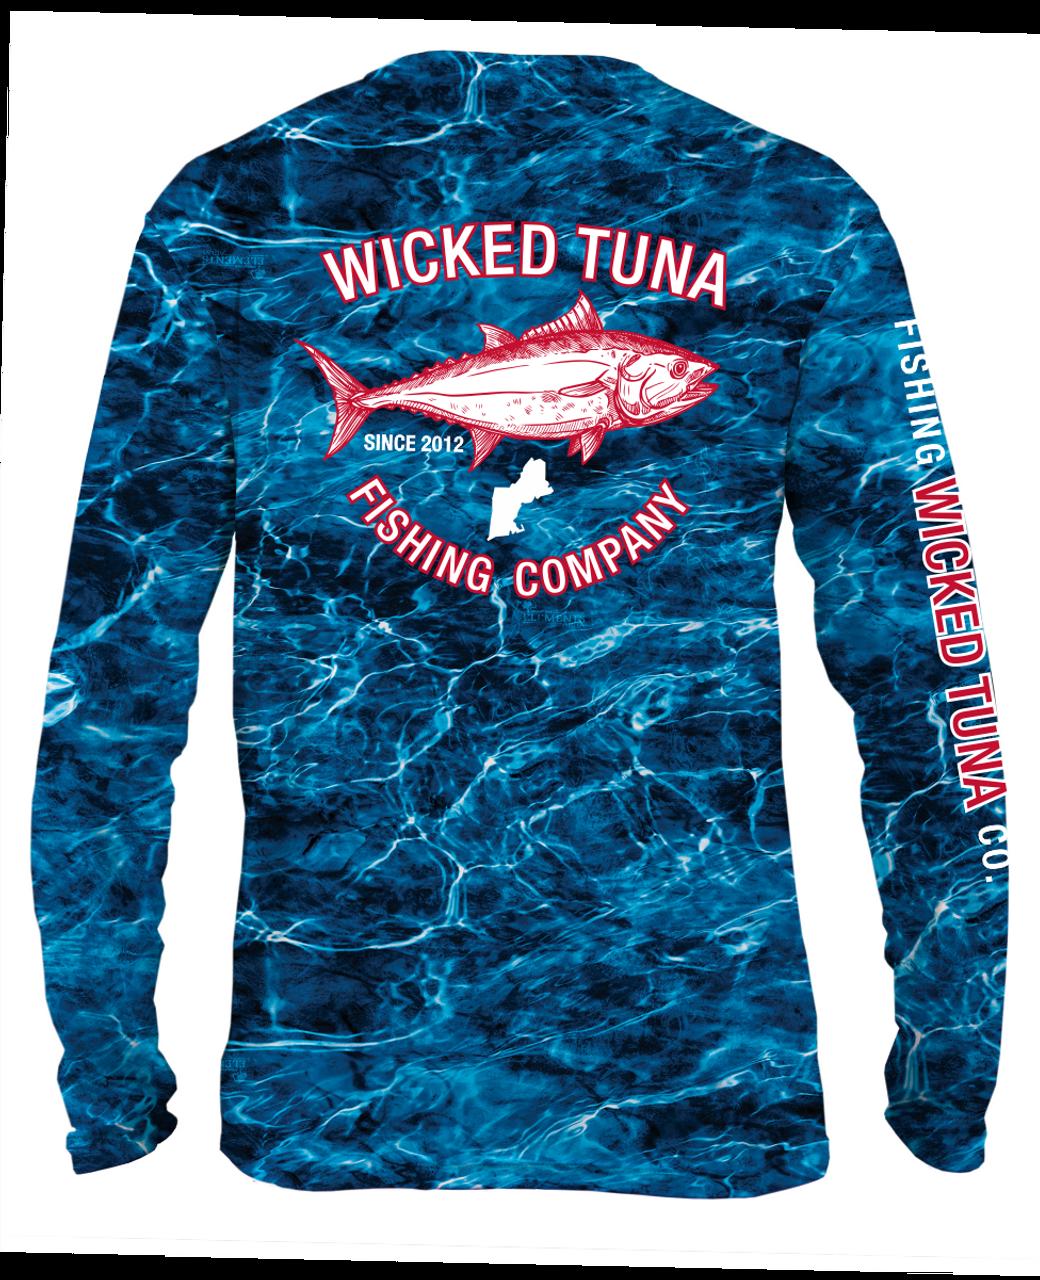 41ab706b36212 Wicked Tuna Mossy Oak Elements Performance UPF 50+ shirt - Wicked ...